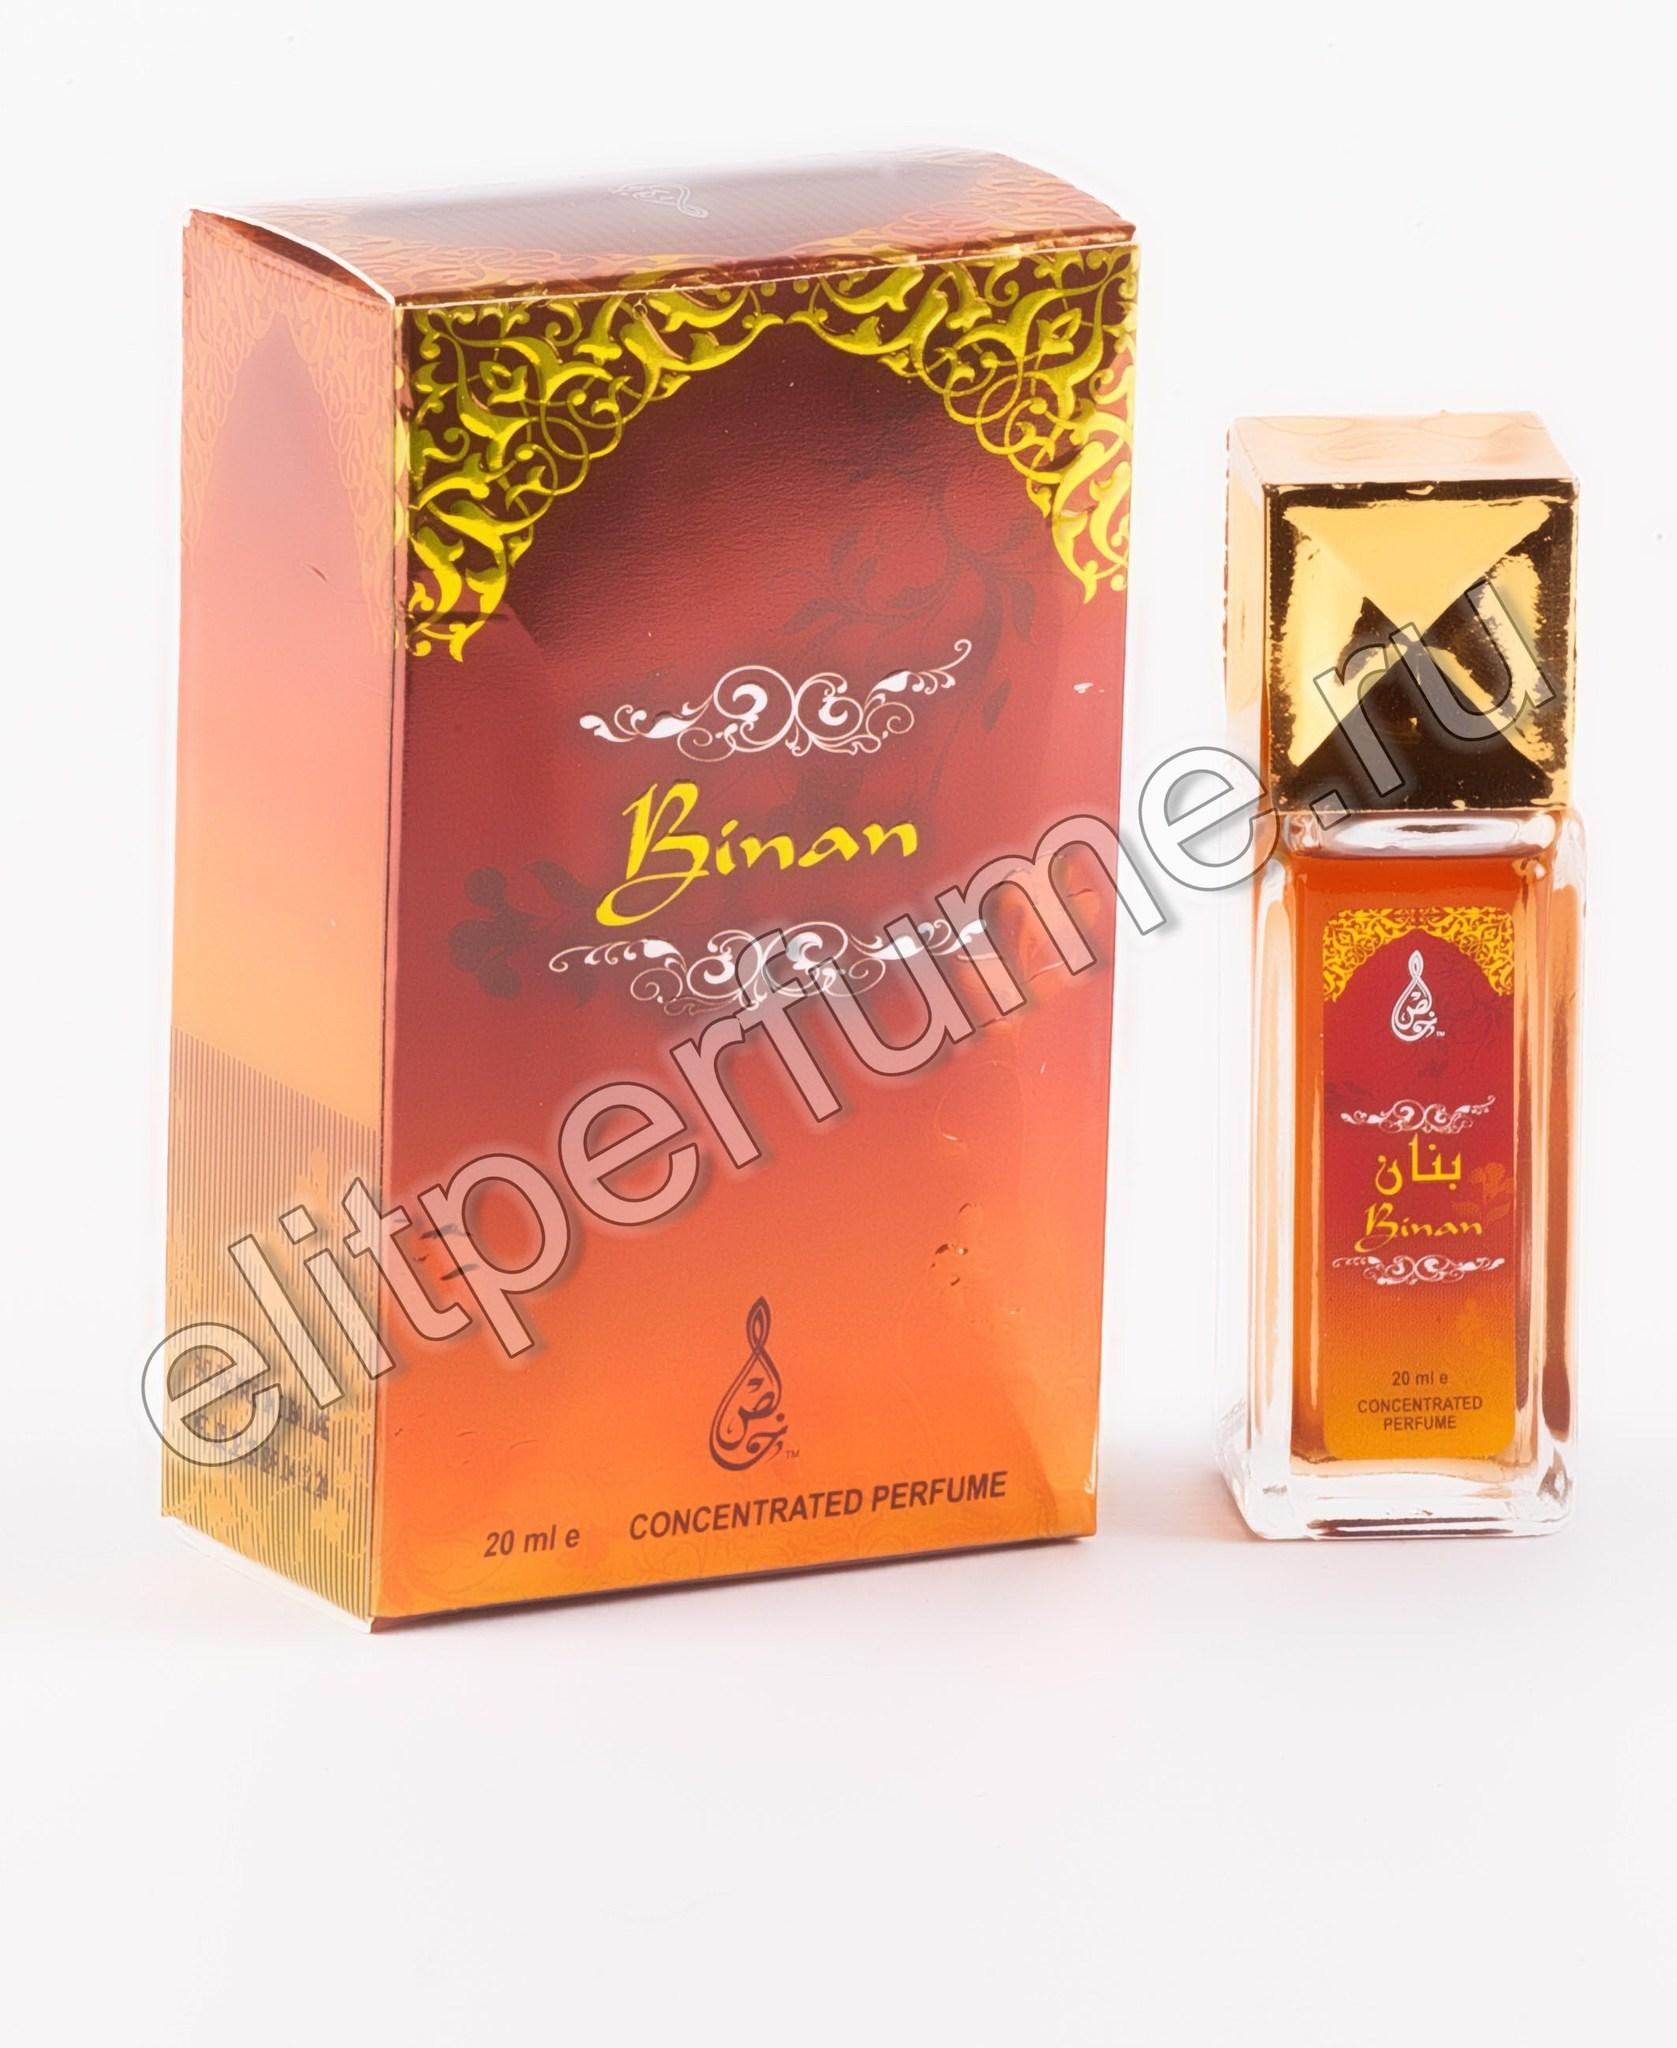 Пробник для Binan Бинан 1 мл арабские масляные духи от Халис Khalis Perfumes